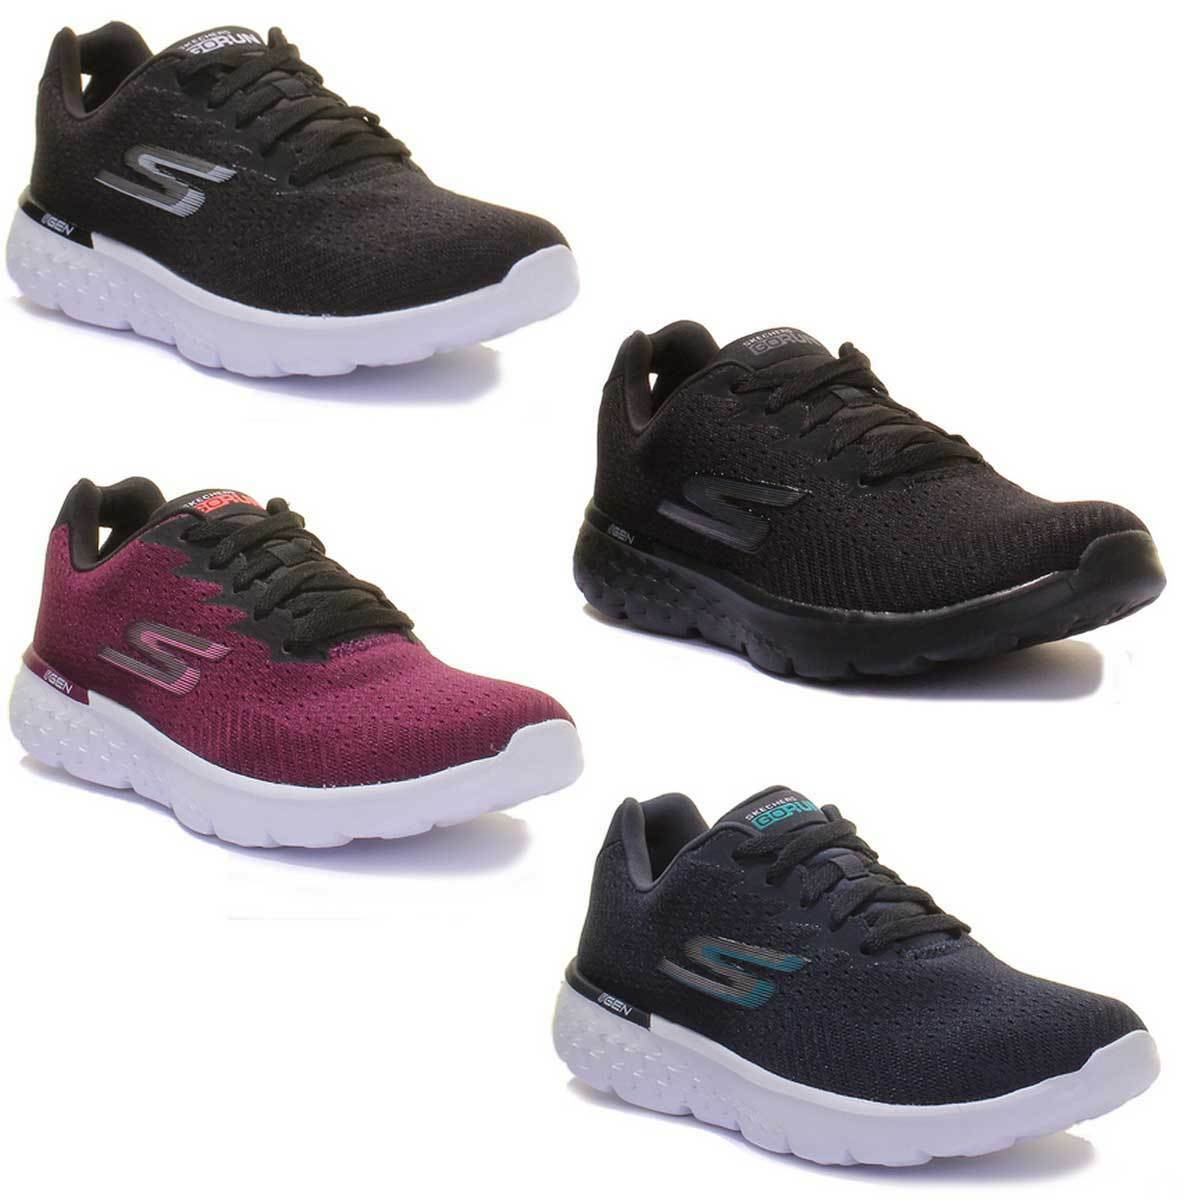 Skechers Go Run 400 Run damen Comfort Trainer Größe UK 3 - 8